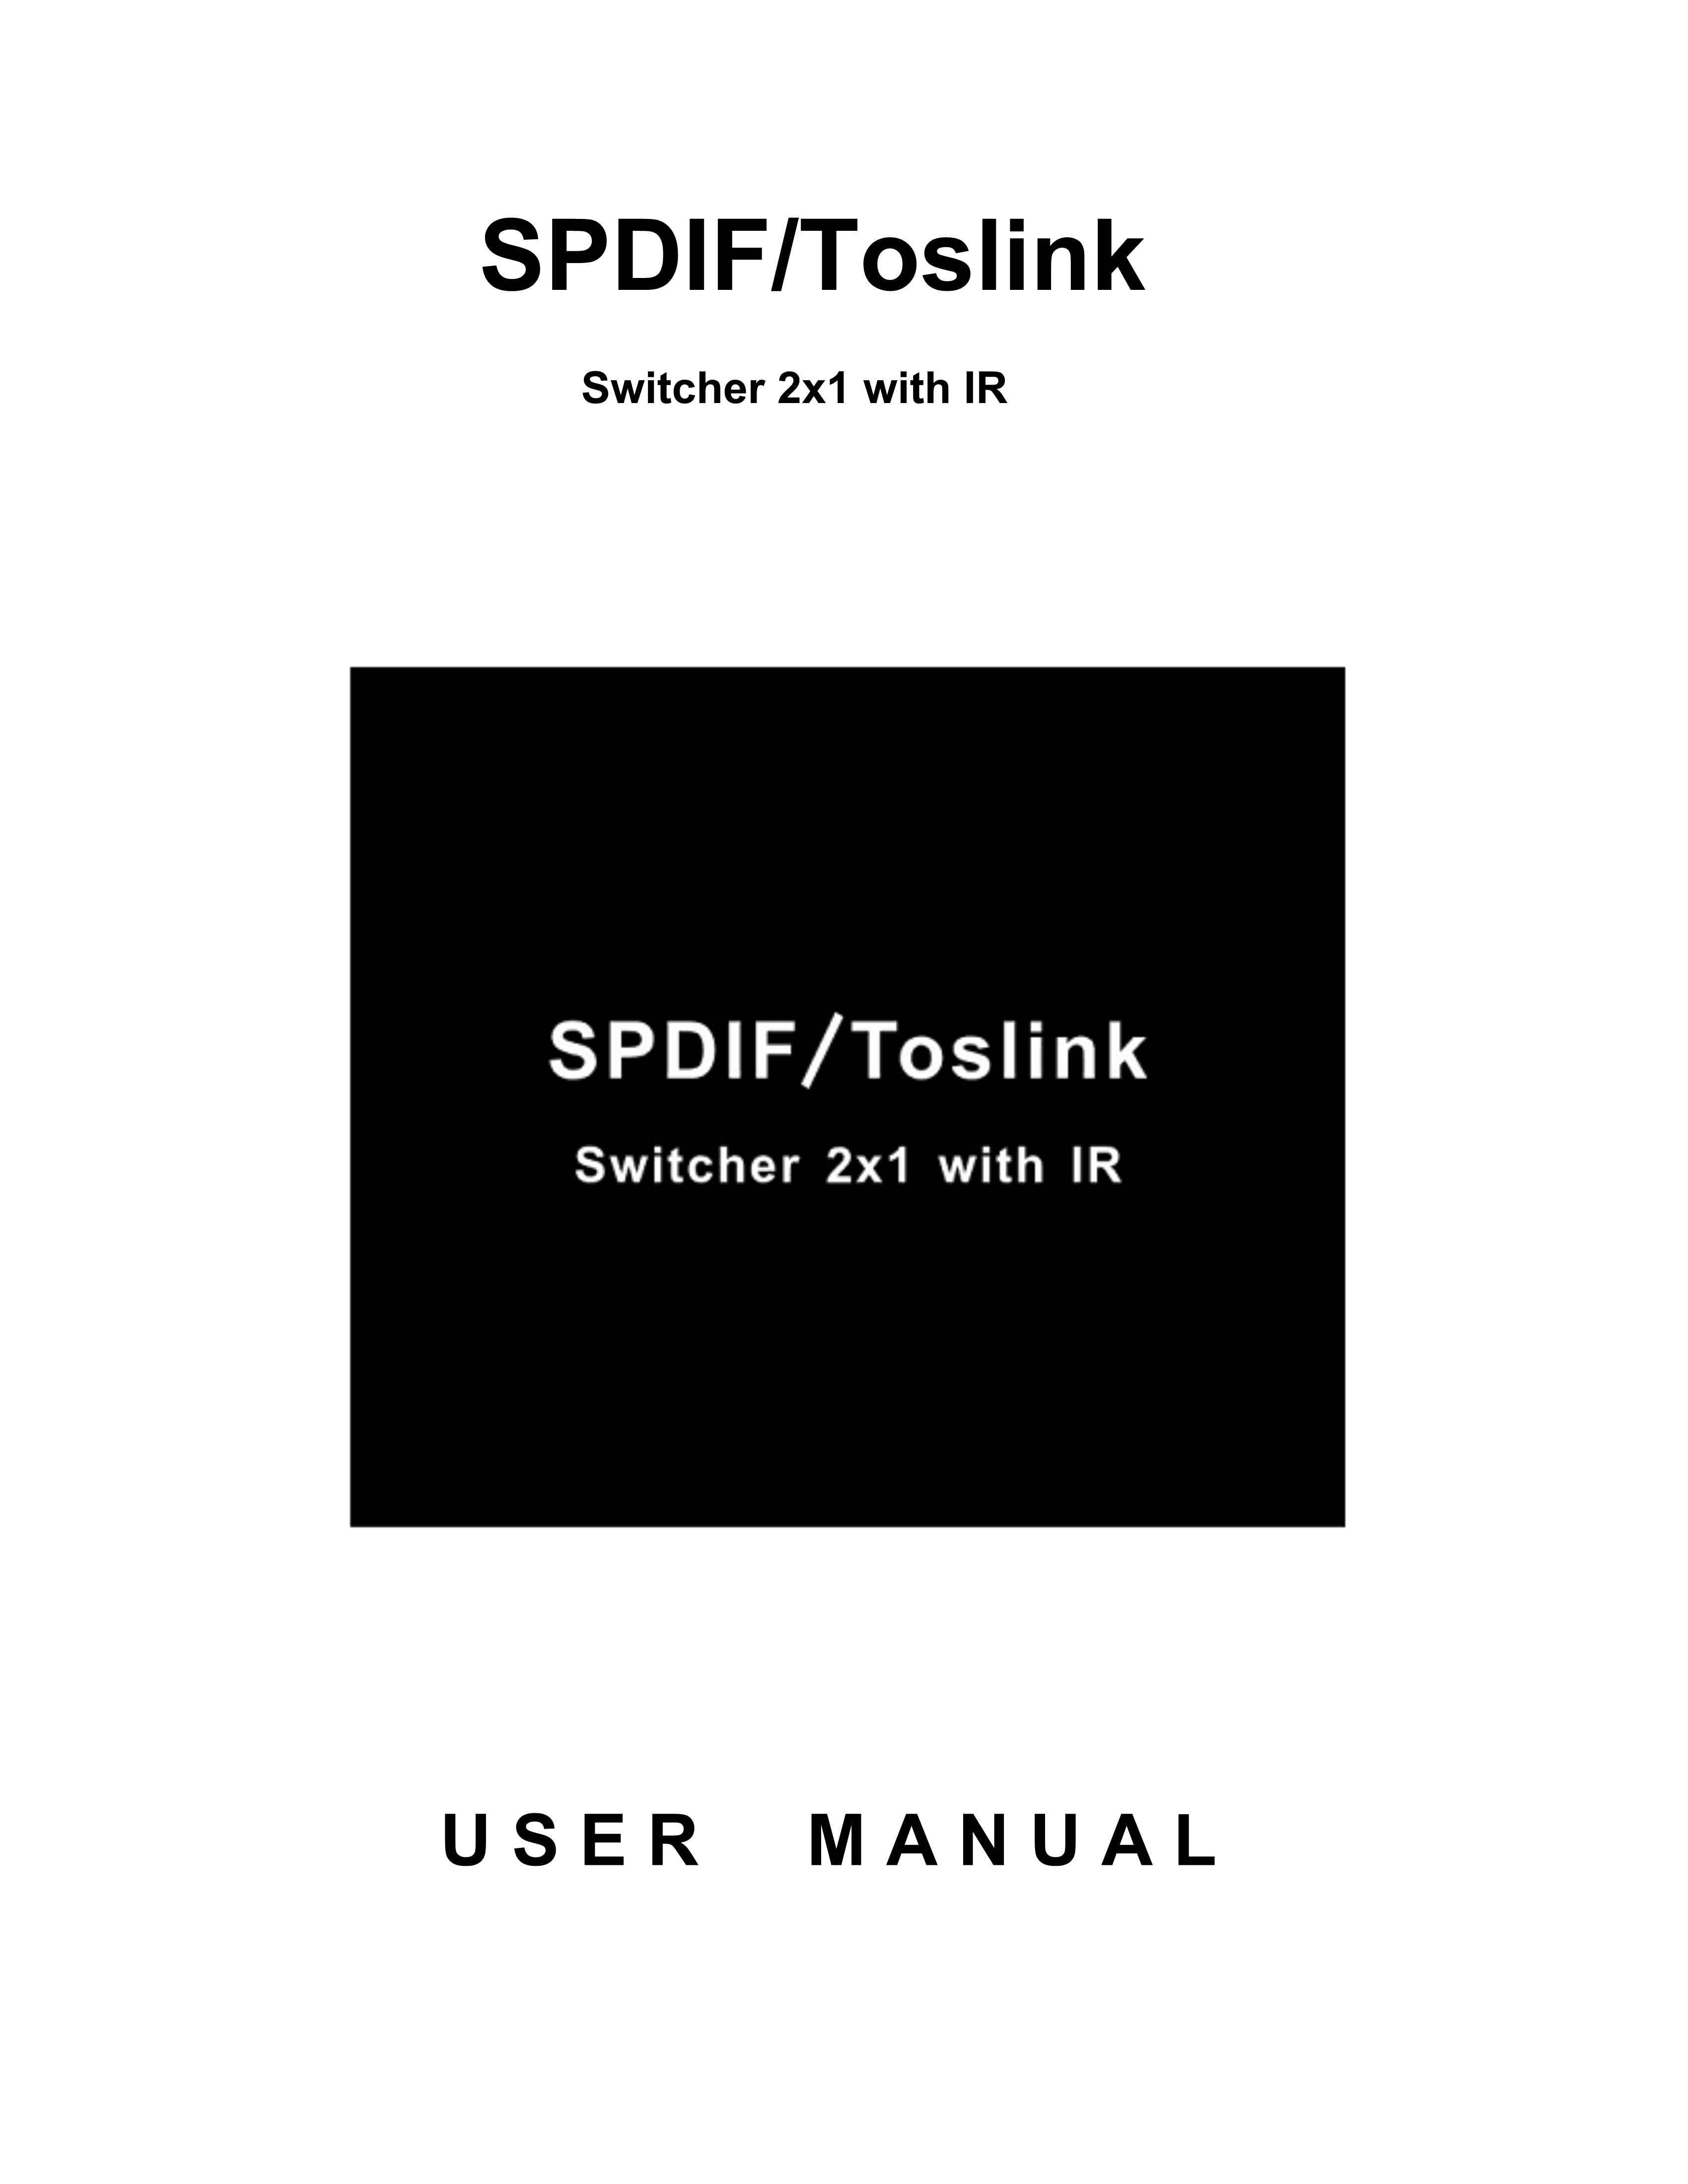 3 in 1 Audio Interruttore Ottico Spdif/Toslink Switcher Splitter Adattatore con Ir Remote Controller 5 Ingresso 1 Uscita per Dvd Ps4